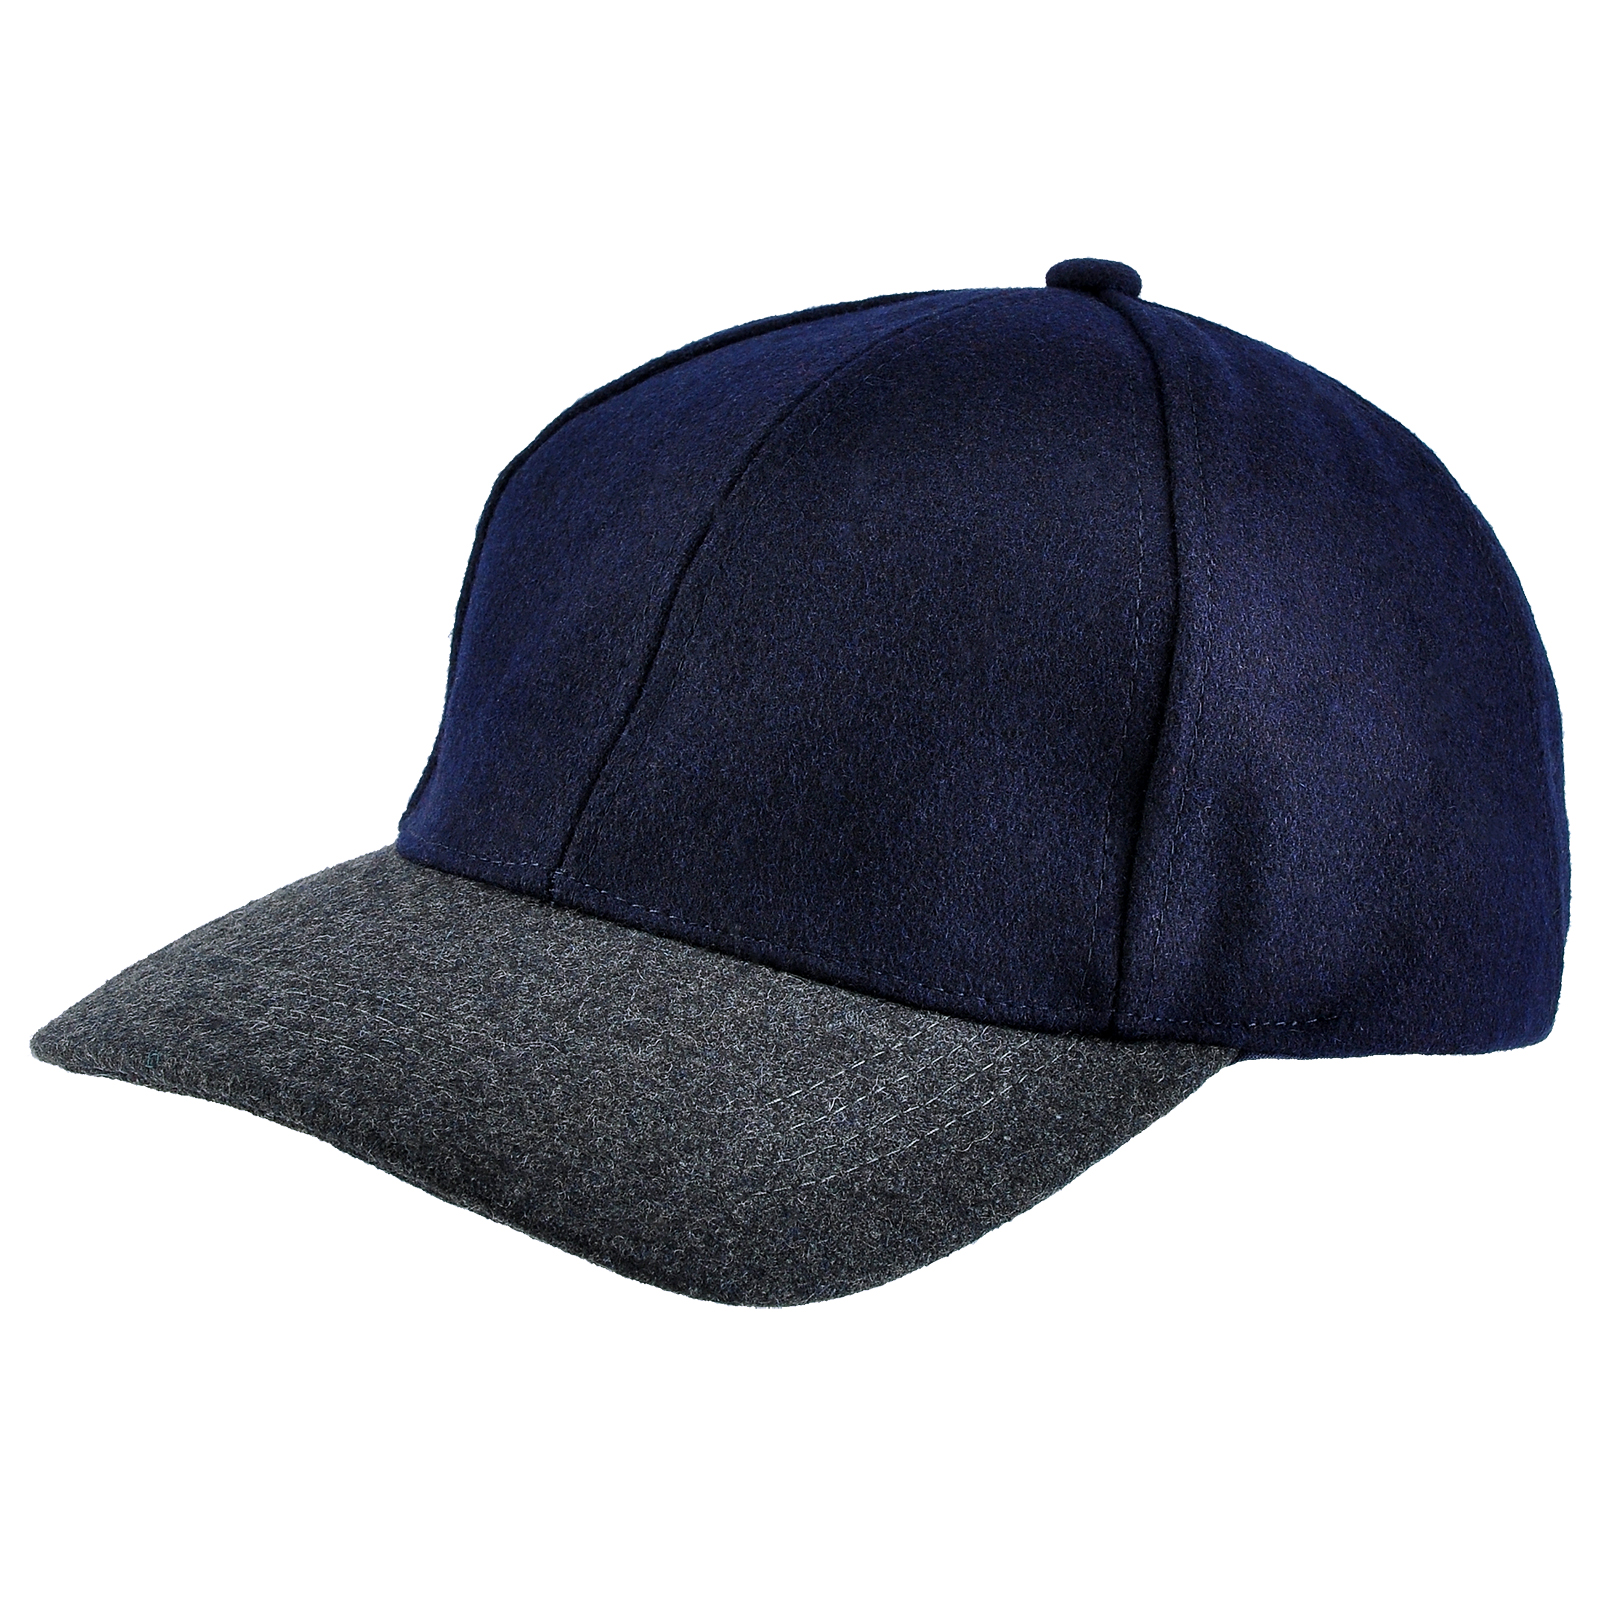 CP-00639-F16-casquette-laine-homme-bleue-marine